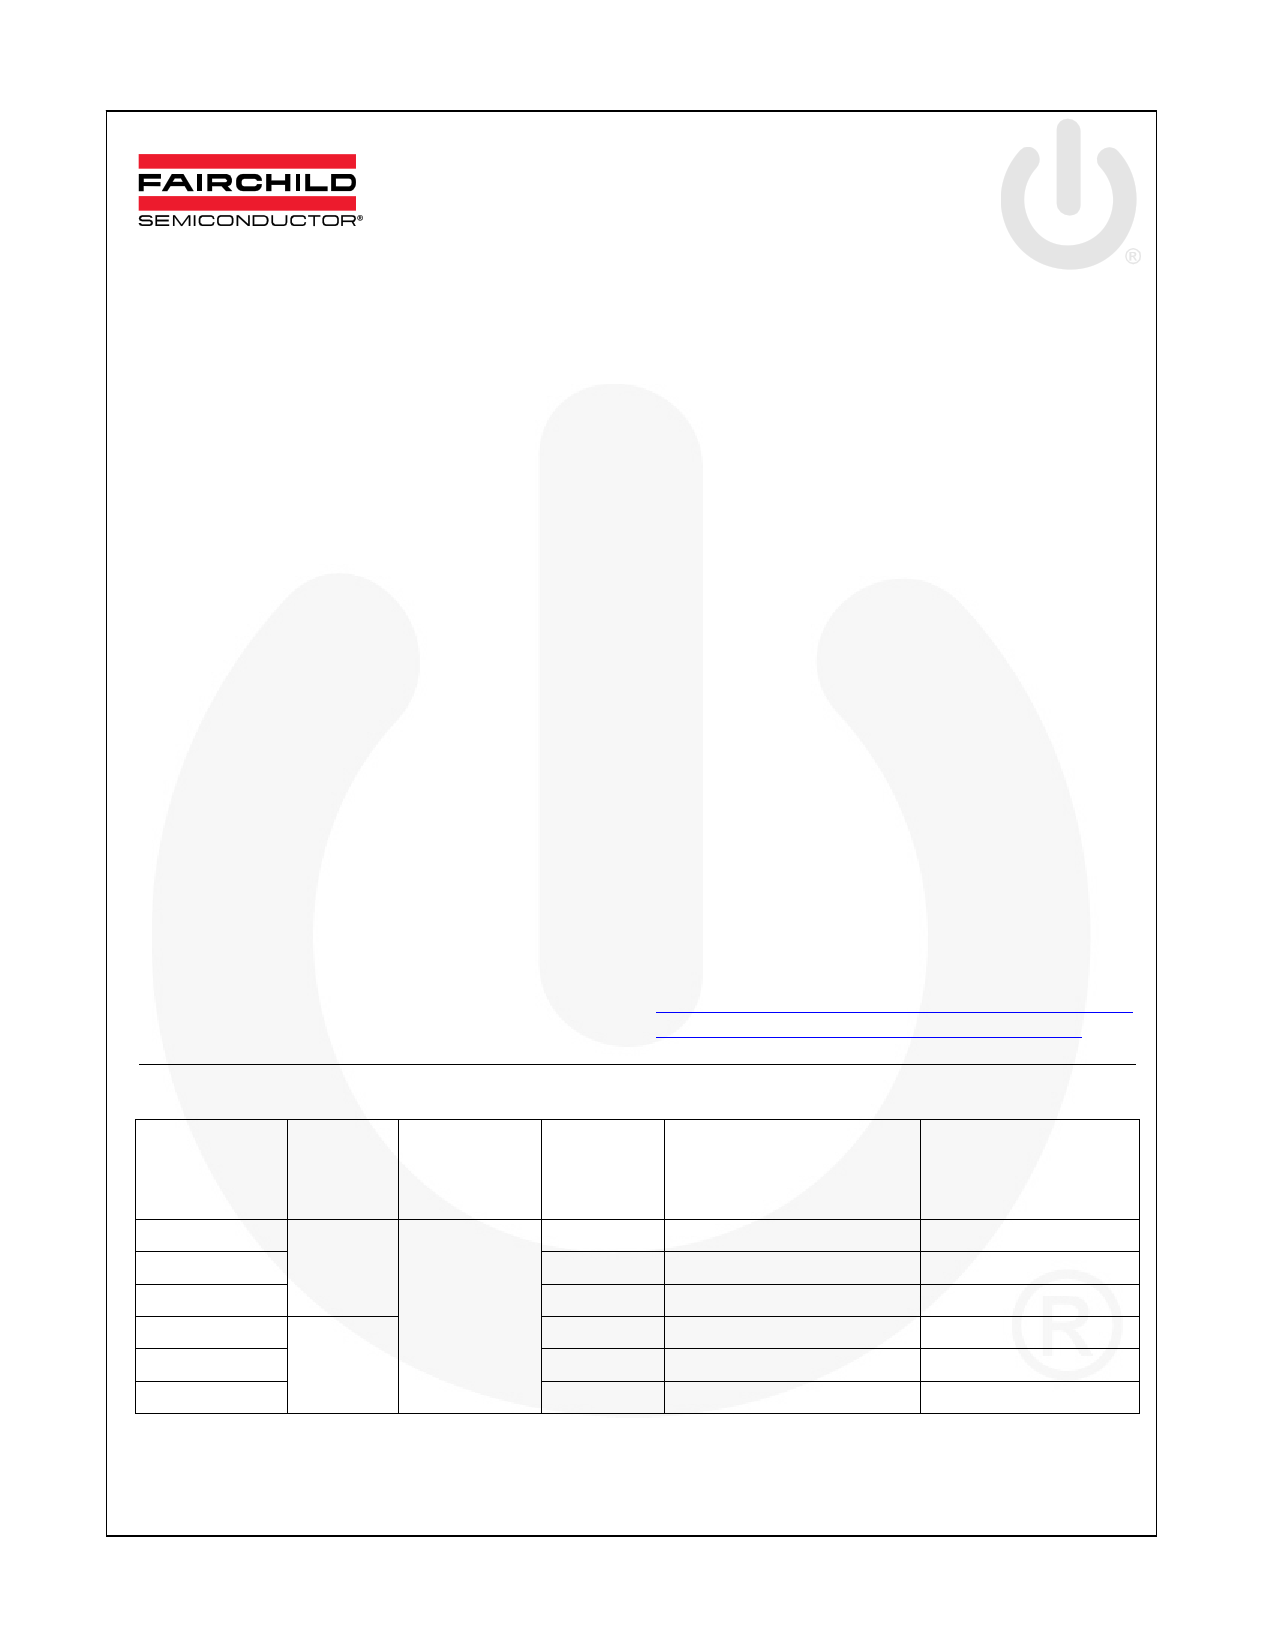 FSFR1800US datasheet